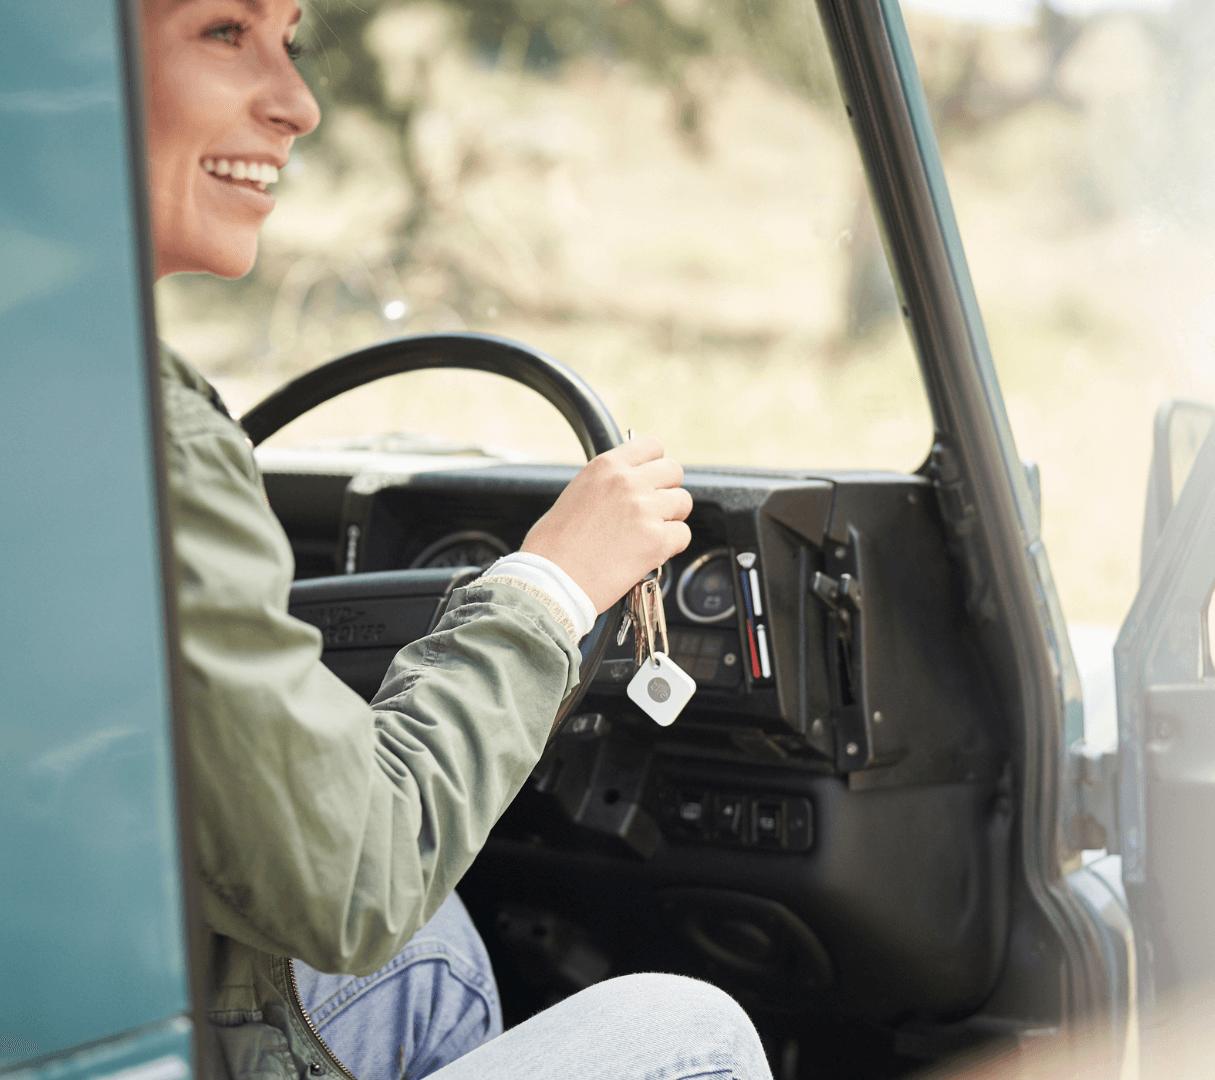 Tile bluetooth trackers help find lost keys